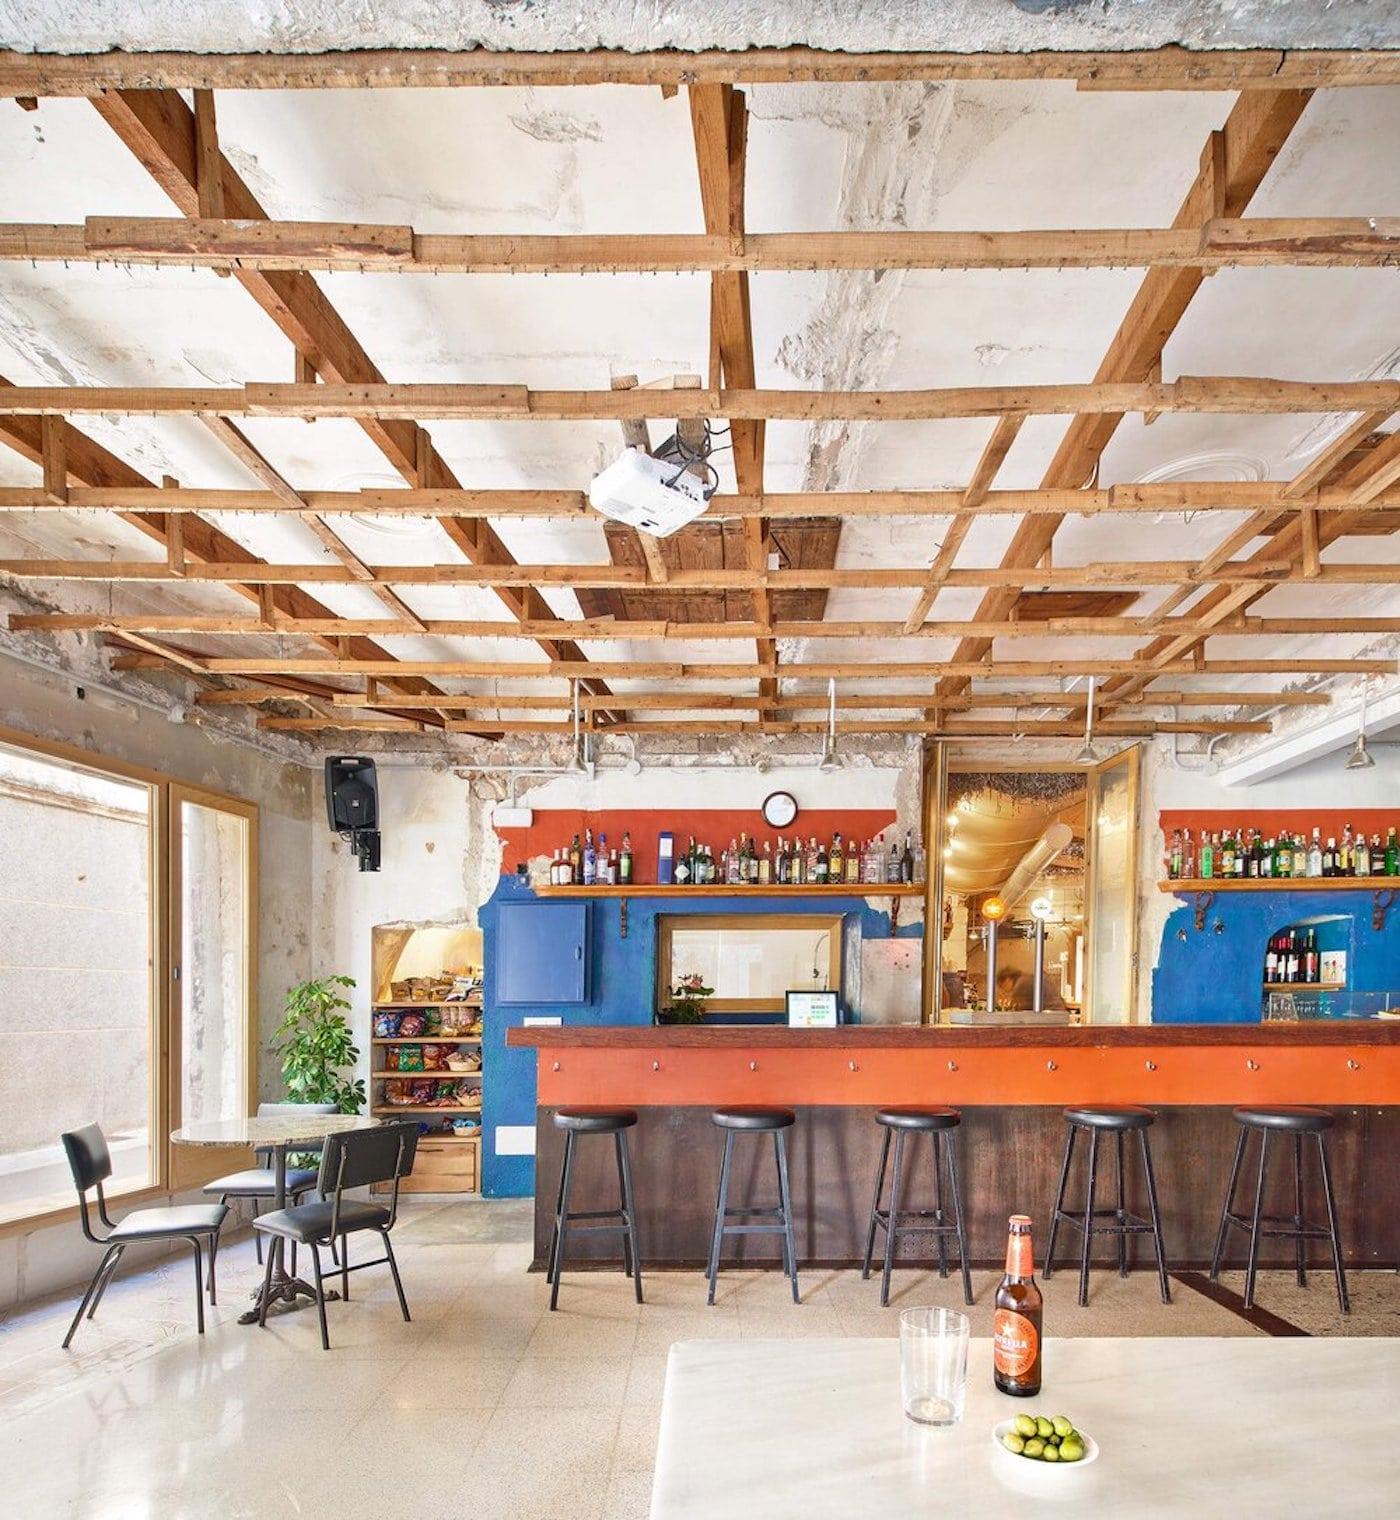 Exposed timber ceiling looking towards timber bar